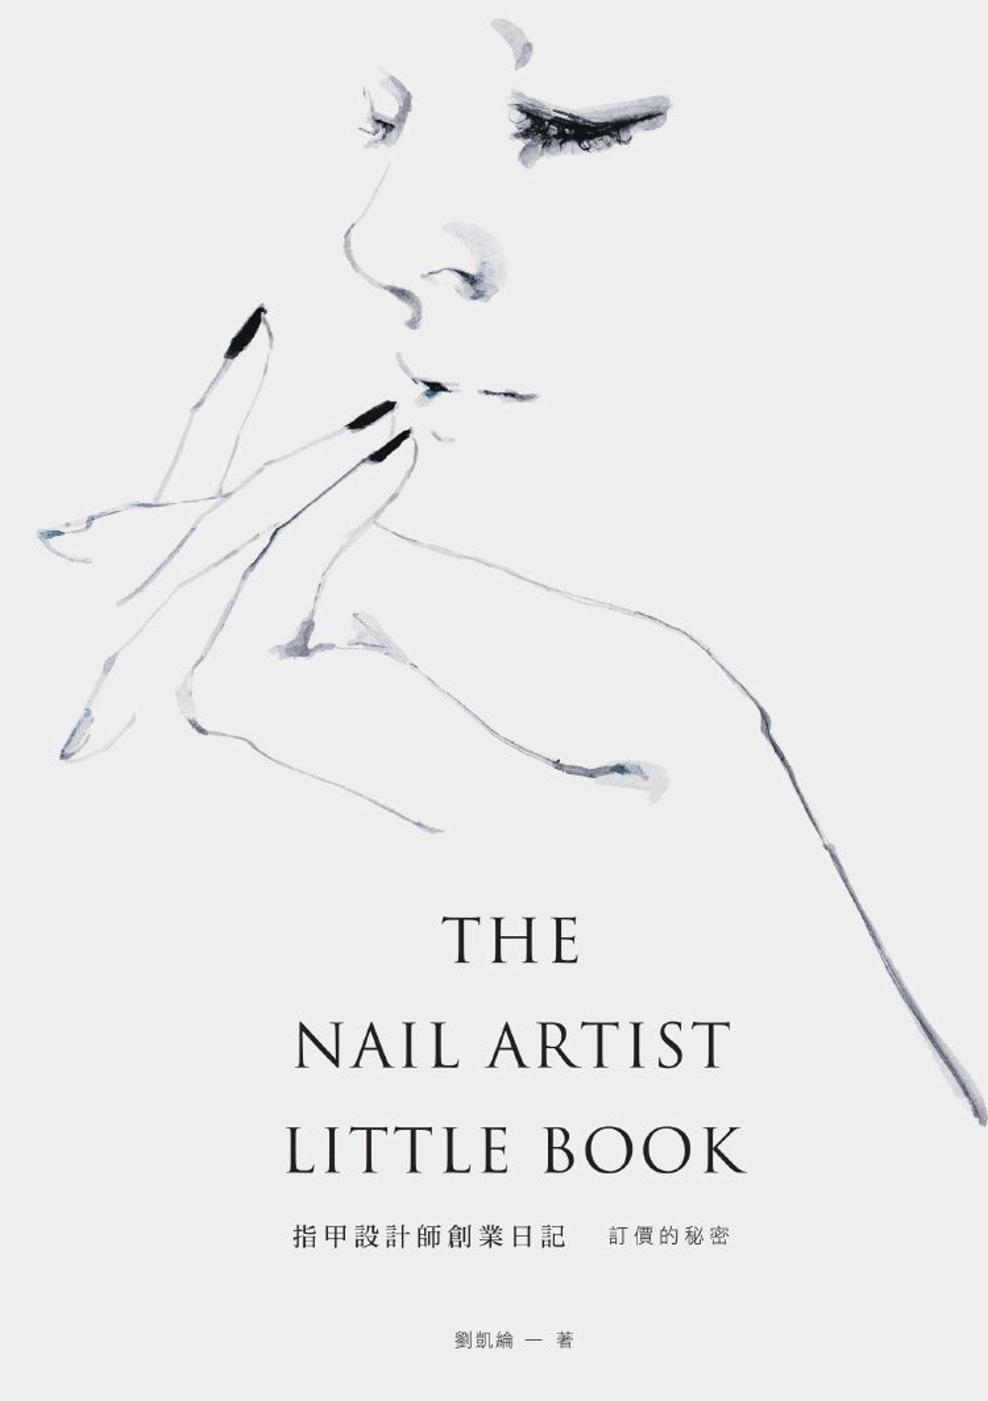 THE NAIL ARTIST LITTLE BOOK 指甲設計師創業日記:訂價的秘密